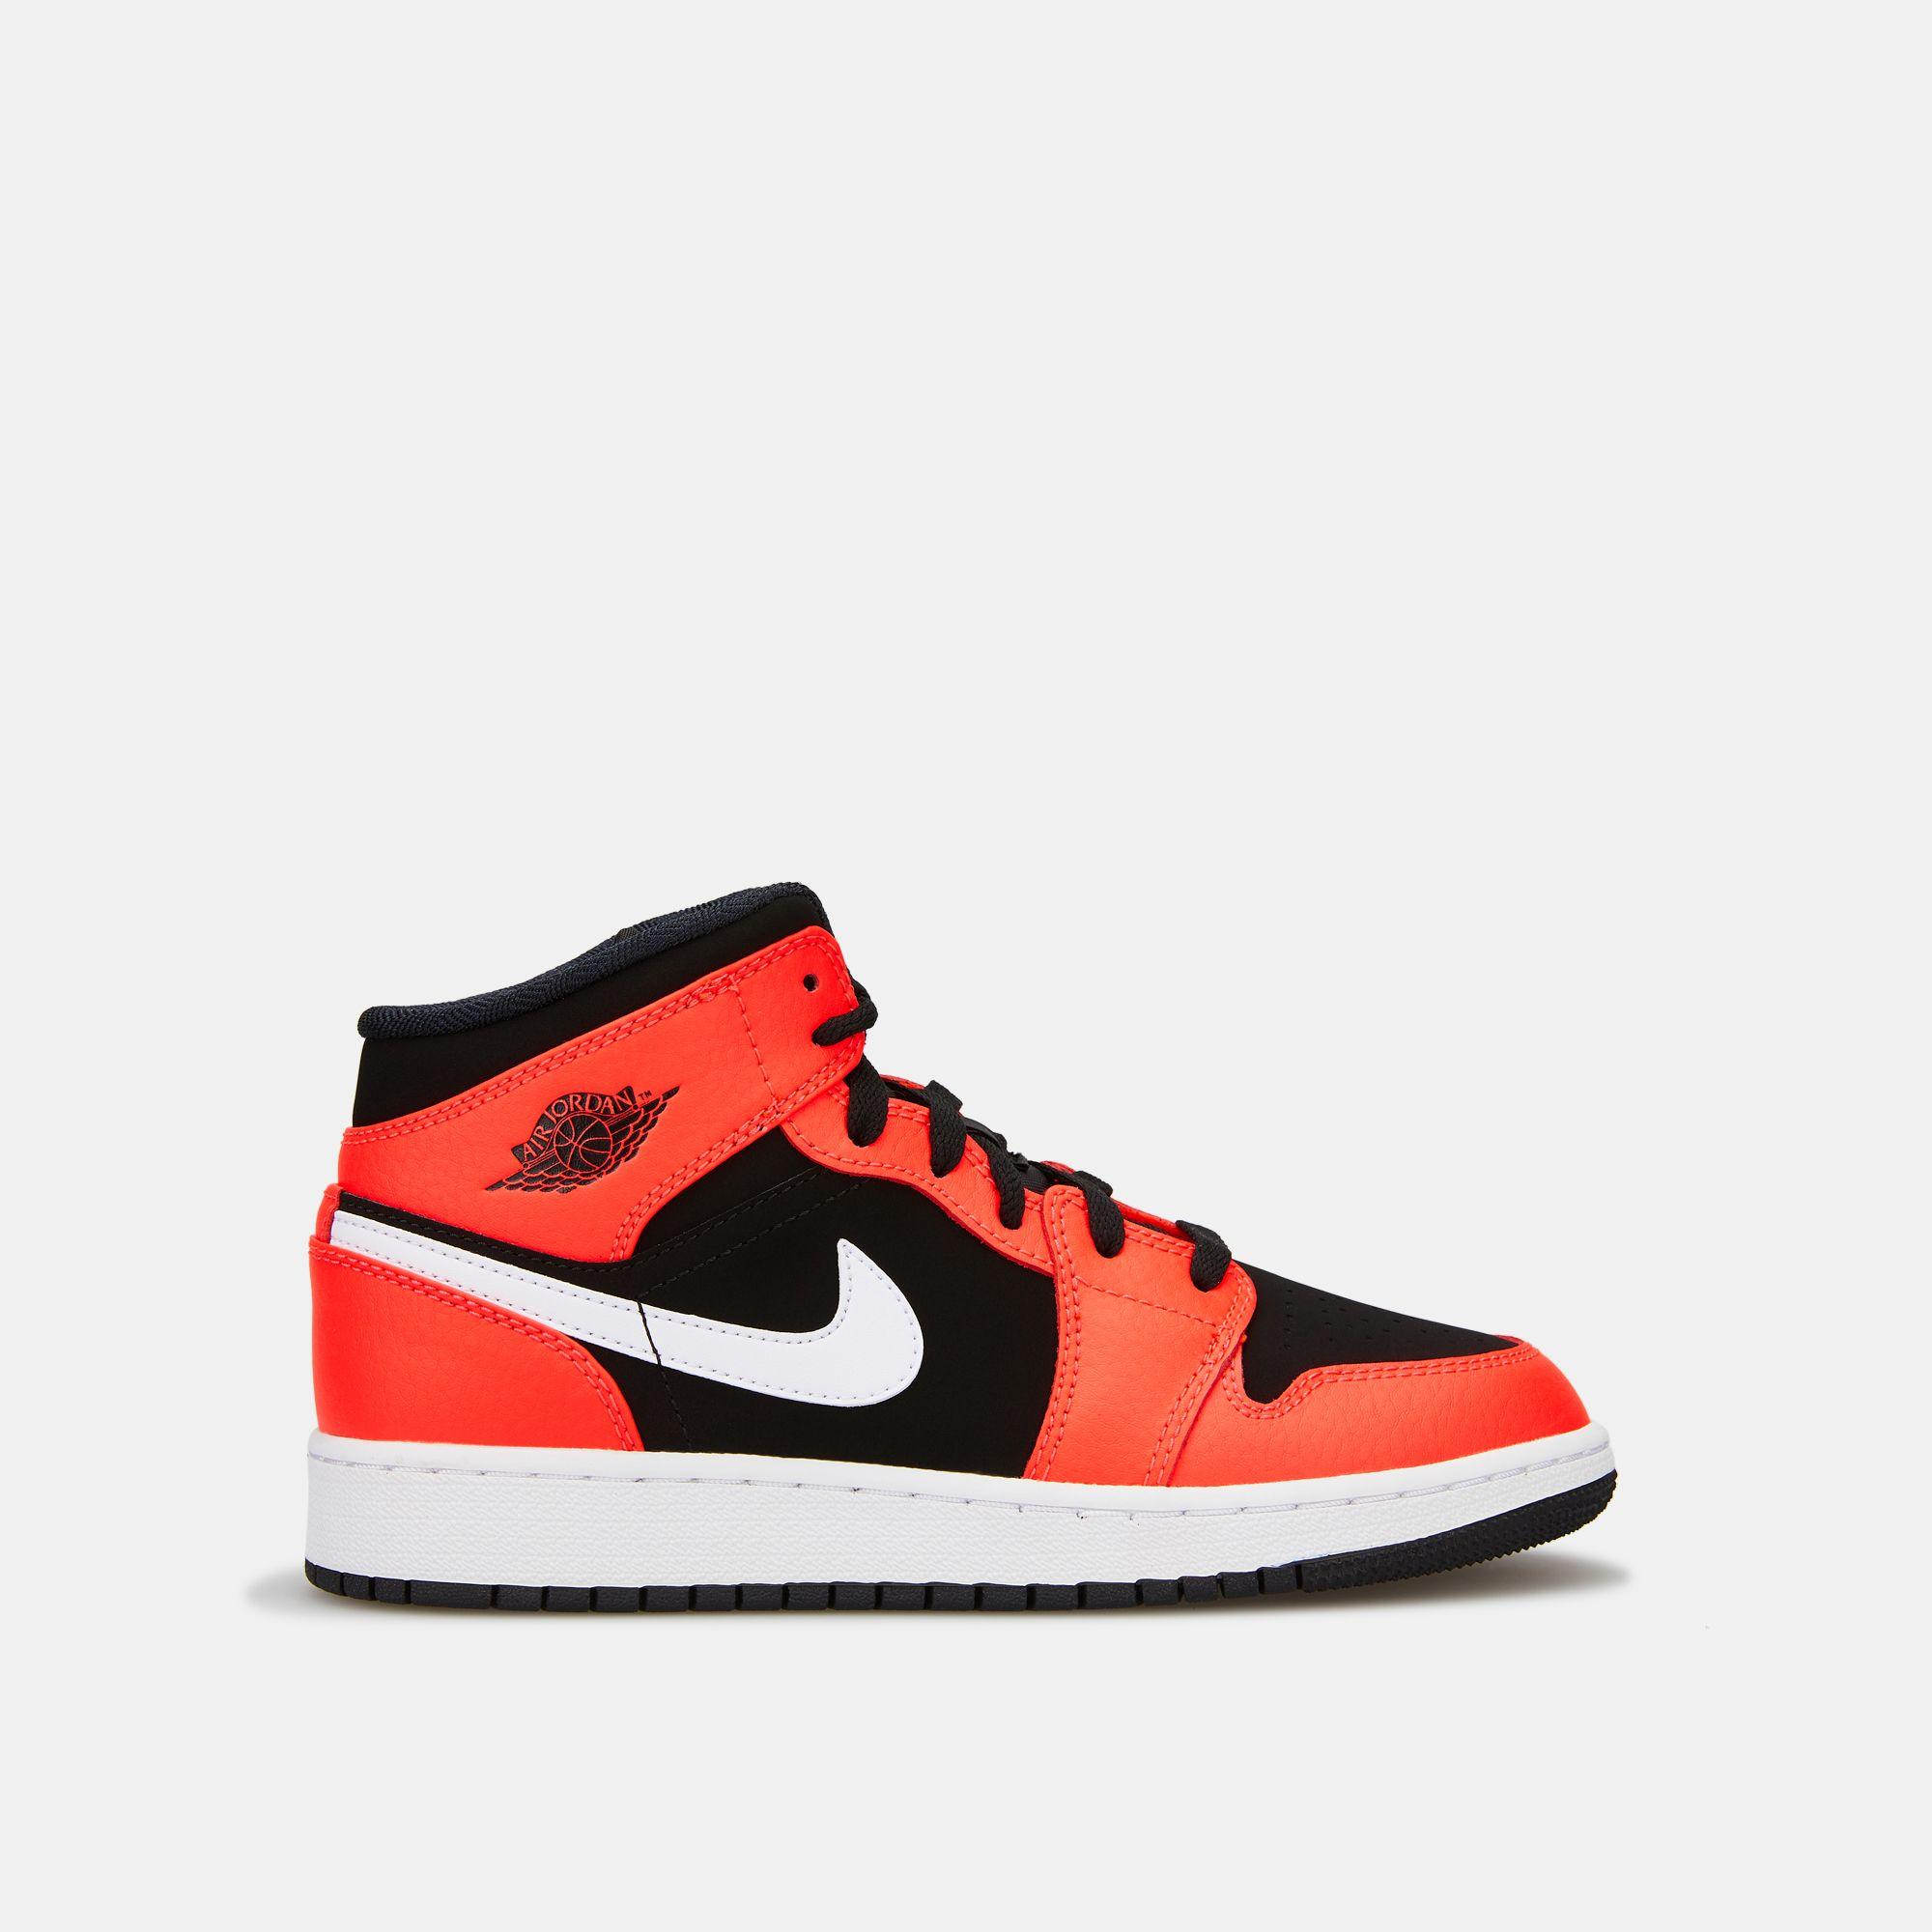 buy popular 7ee31 3e08c Jordan Kids  Air Jordan 1 Mid Shoe (Younger Kids)   Sneakers   Shoes ...